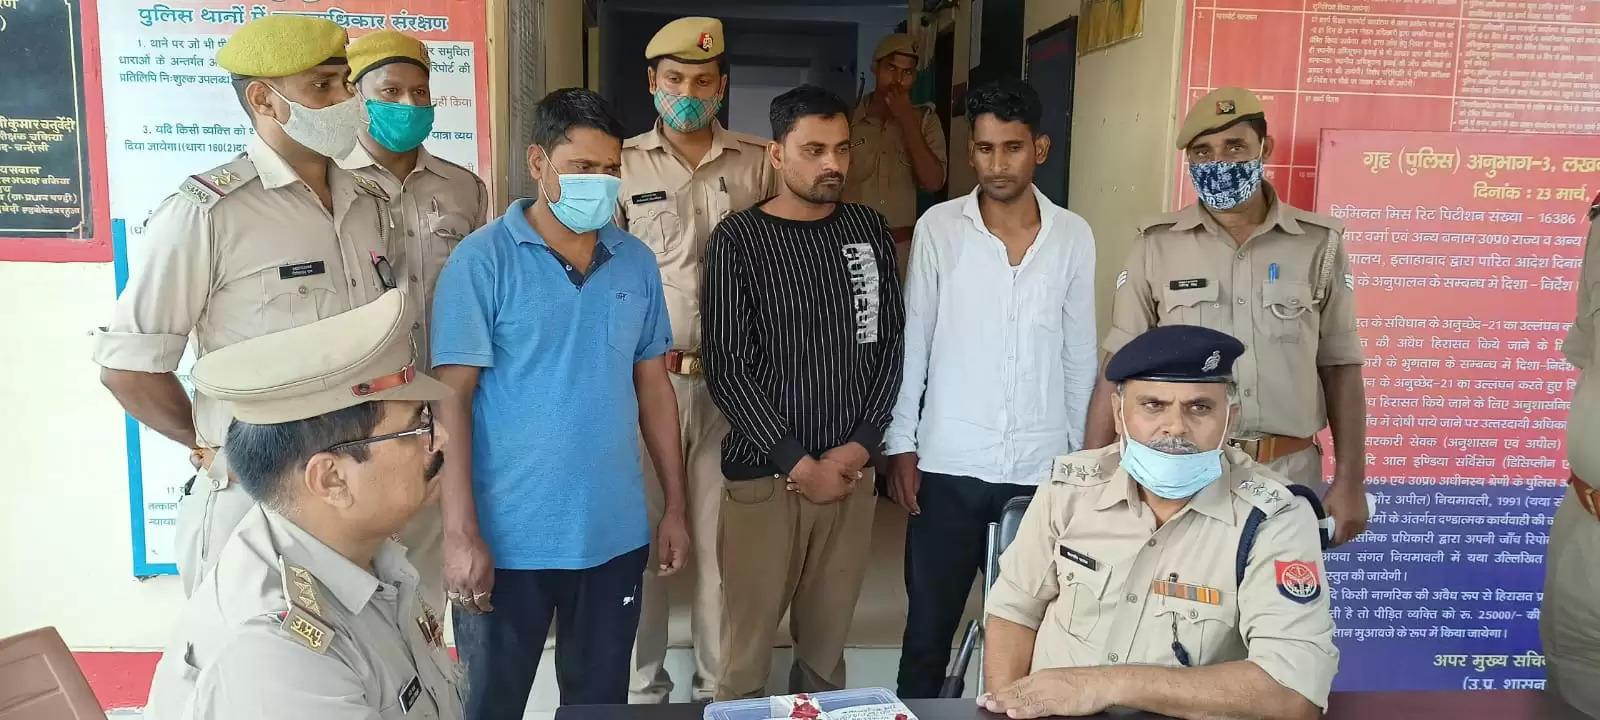 Arrested 3 Pashu Taskar